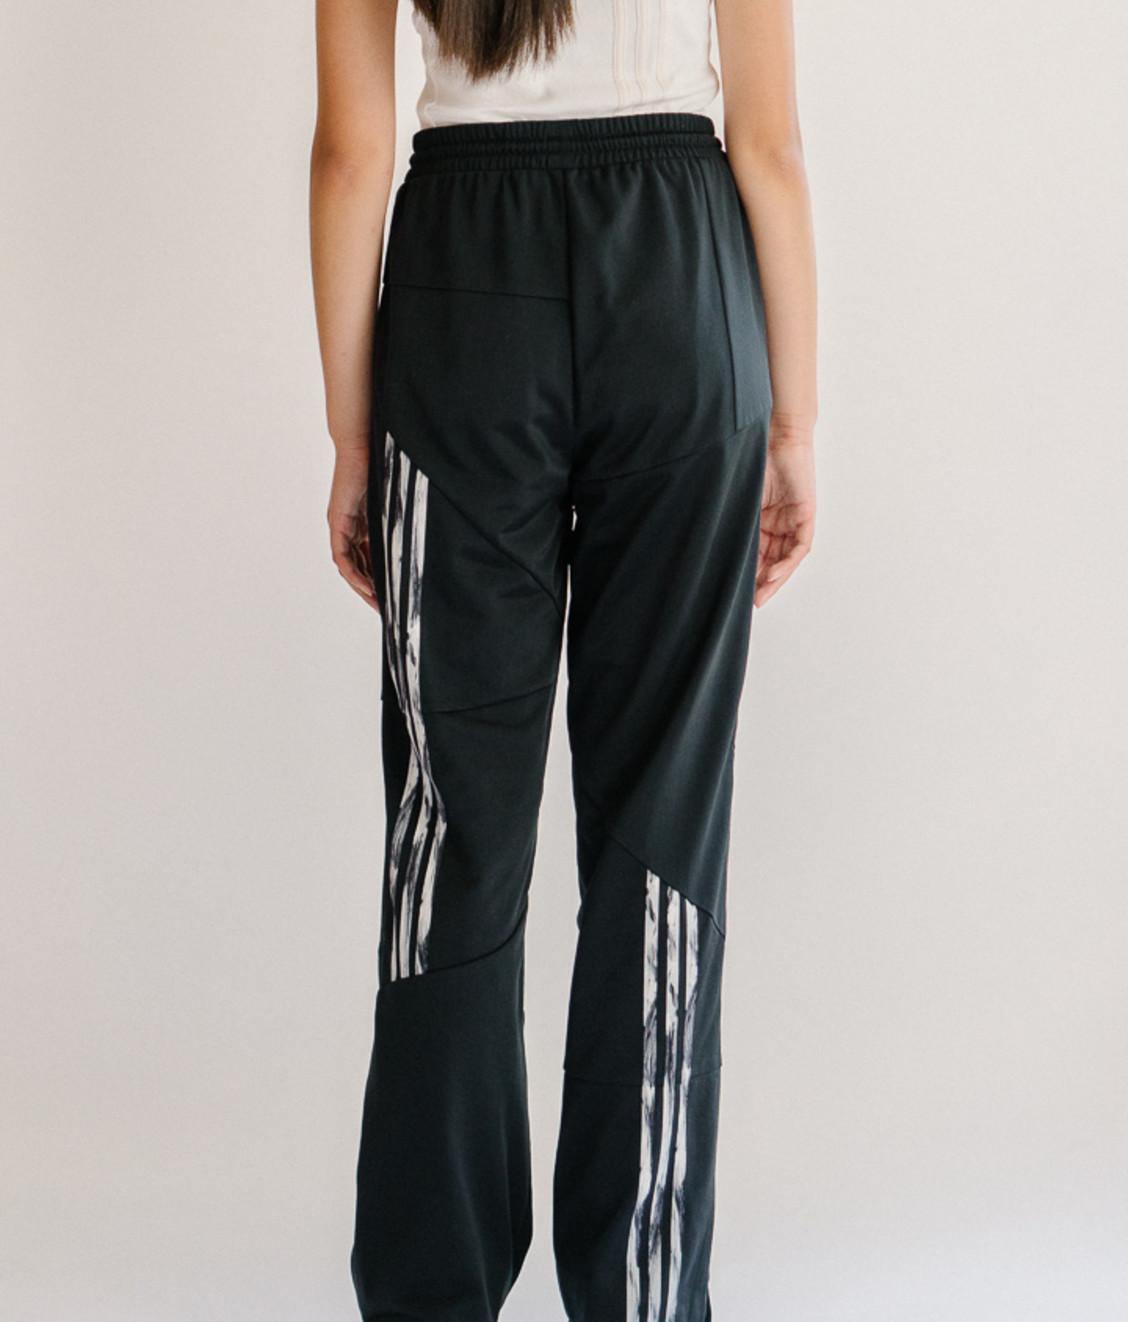 Adidas Adidas x DC Firebird Track Pant Black